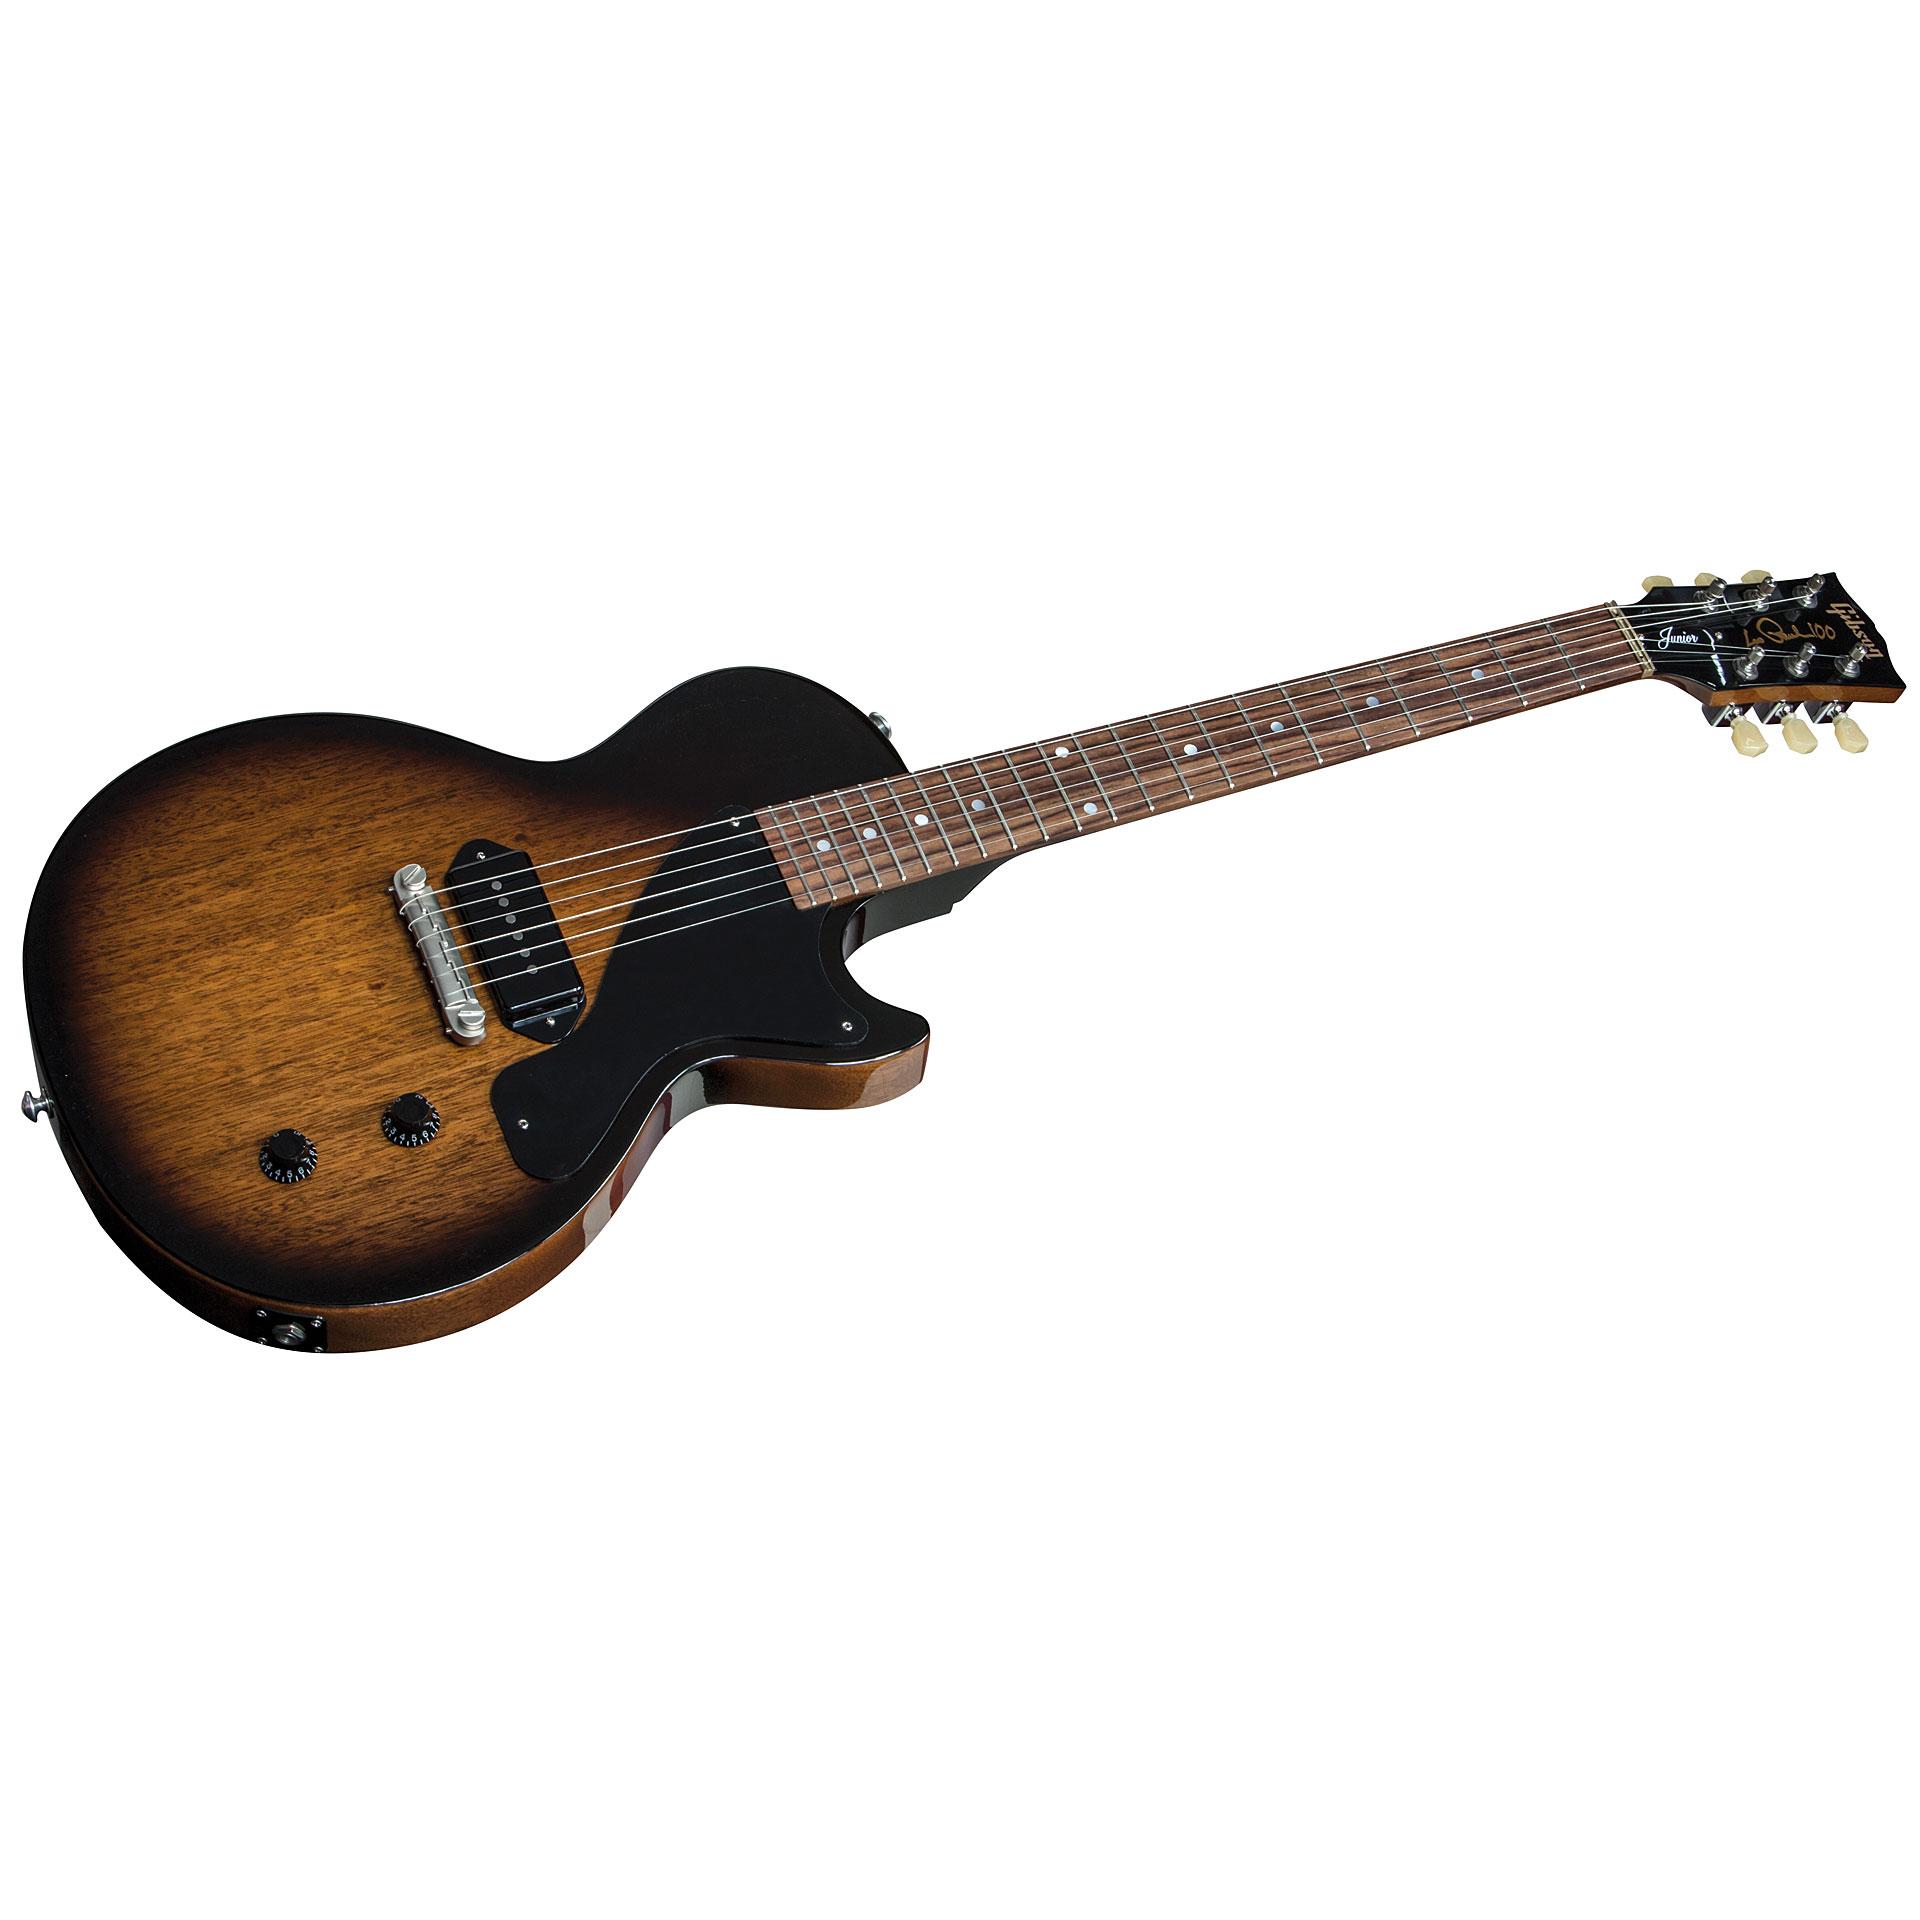 gibson les paul junior 2015 vs electric guitar. Black Bedroom Furniture Sets. Home Design Ideas